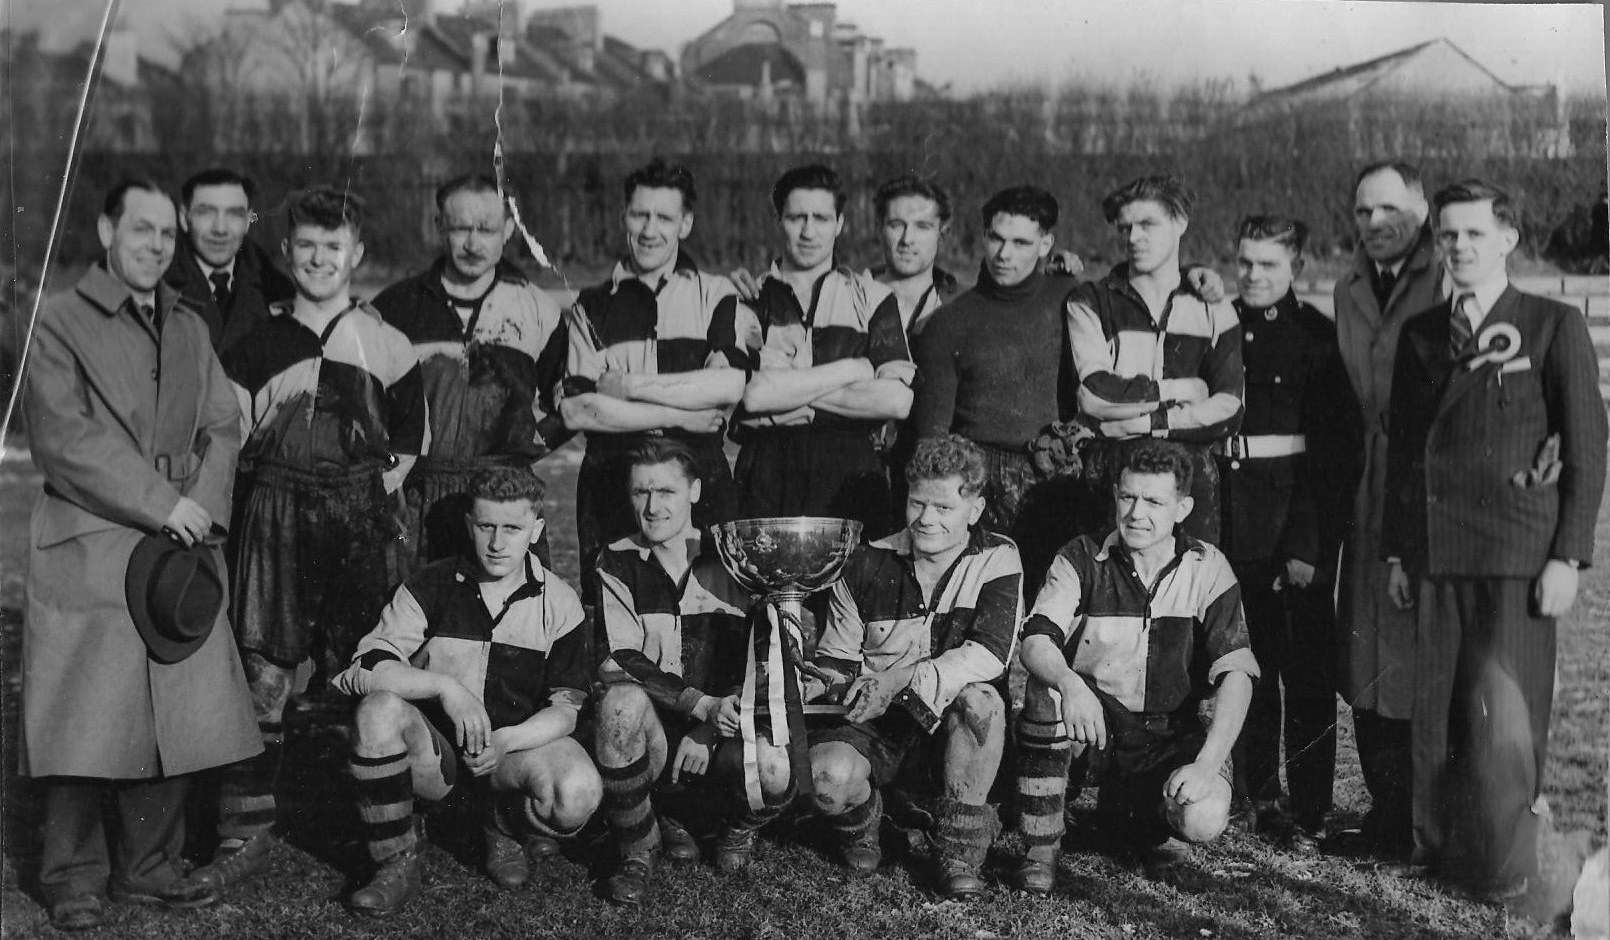 1955 ITCRM TUNNEY CUP WINNERS